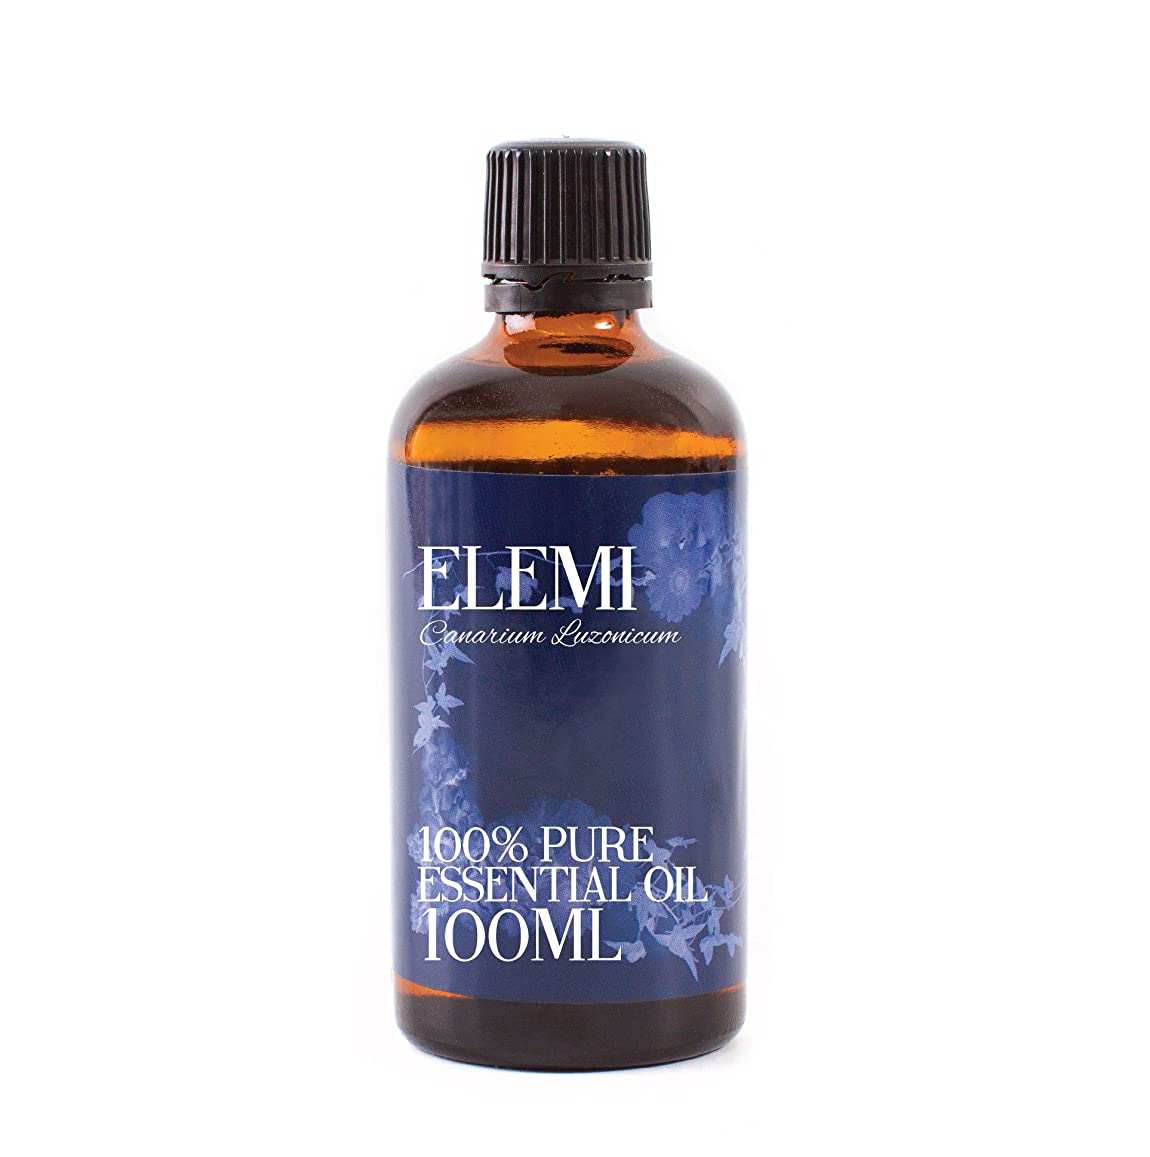 講師無知丁寧Mystic Moments | Elemi Essential Oil - 100ml - 100% Pure